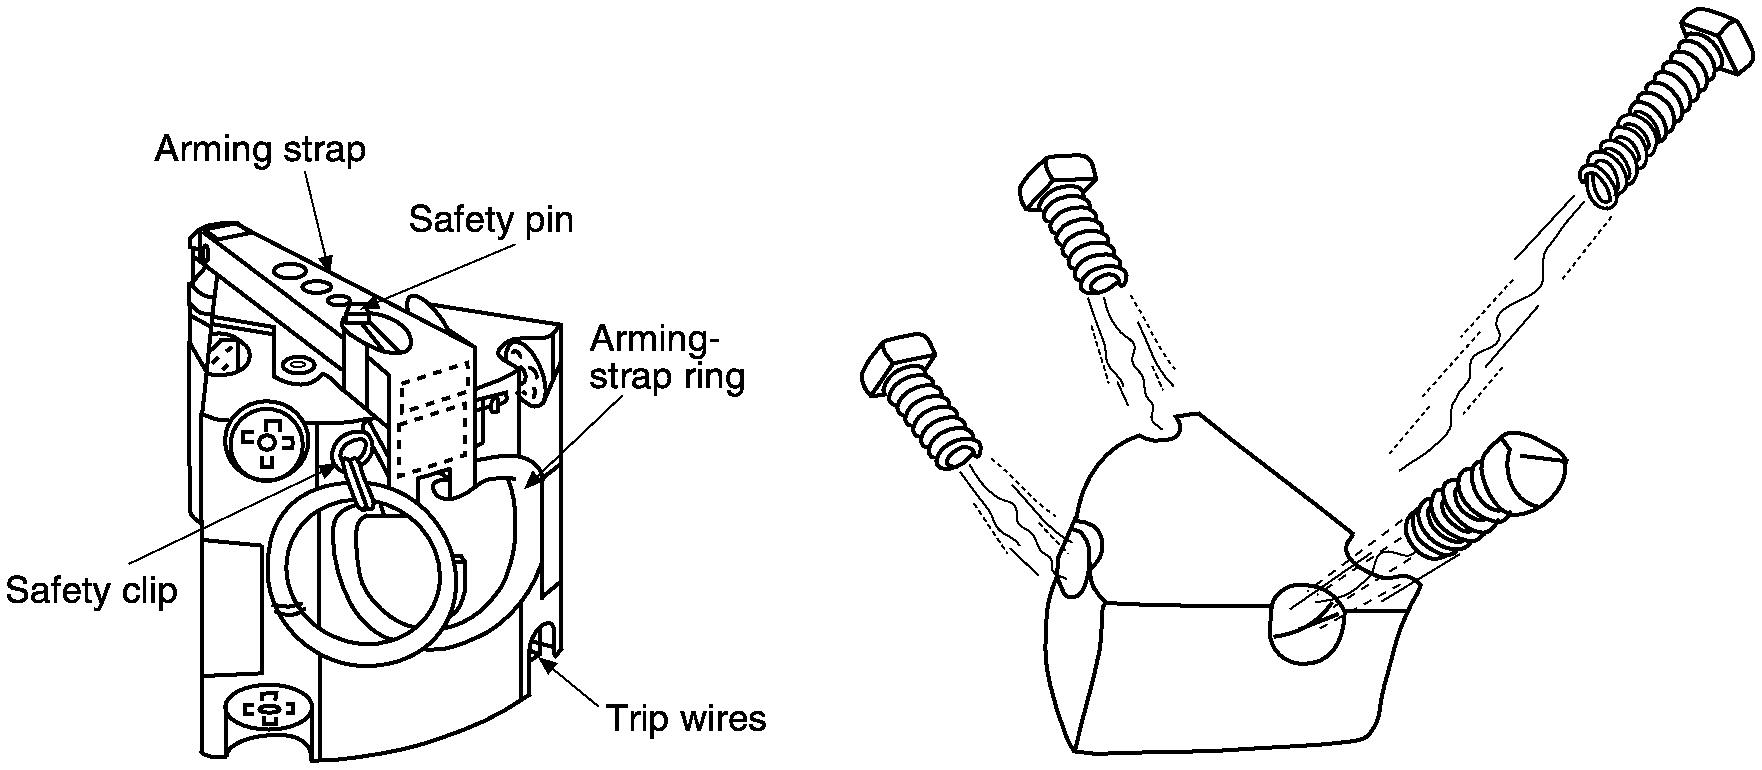 Appendix C Current Types Of U S Landmines